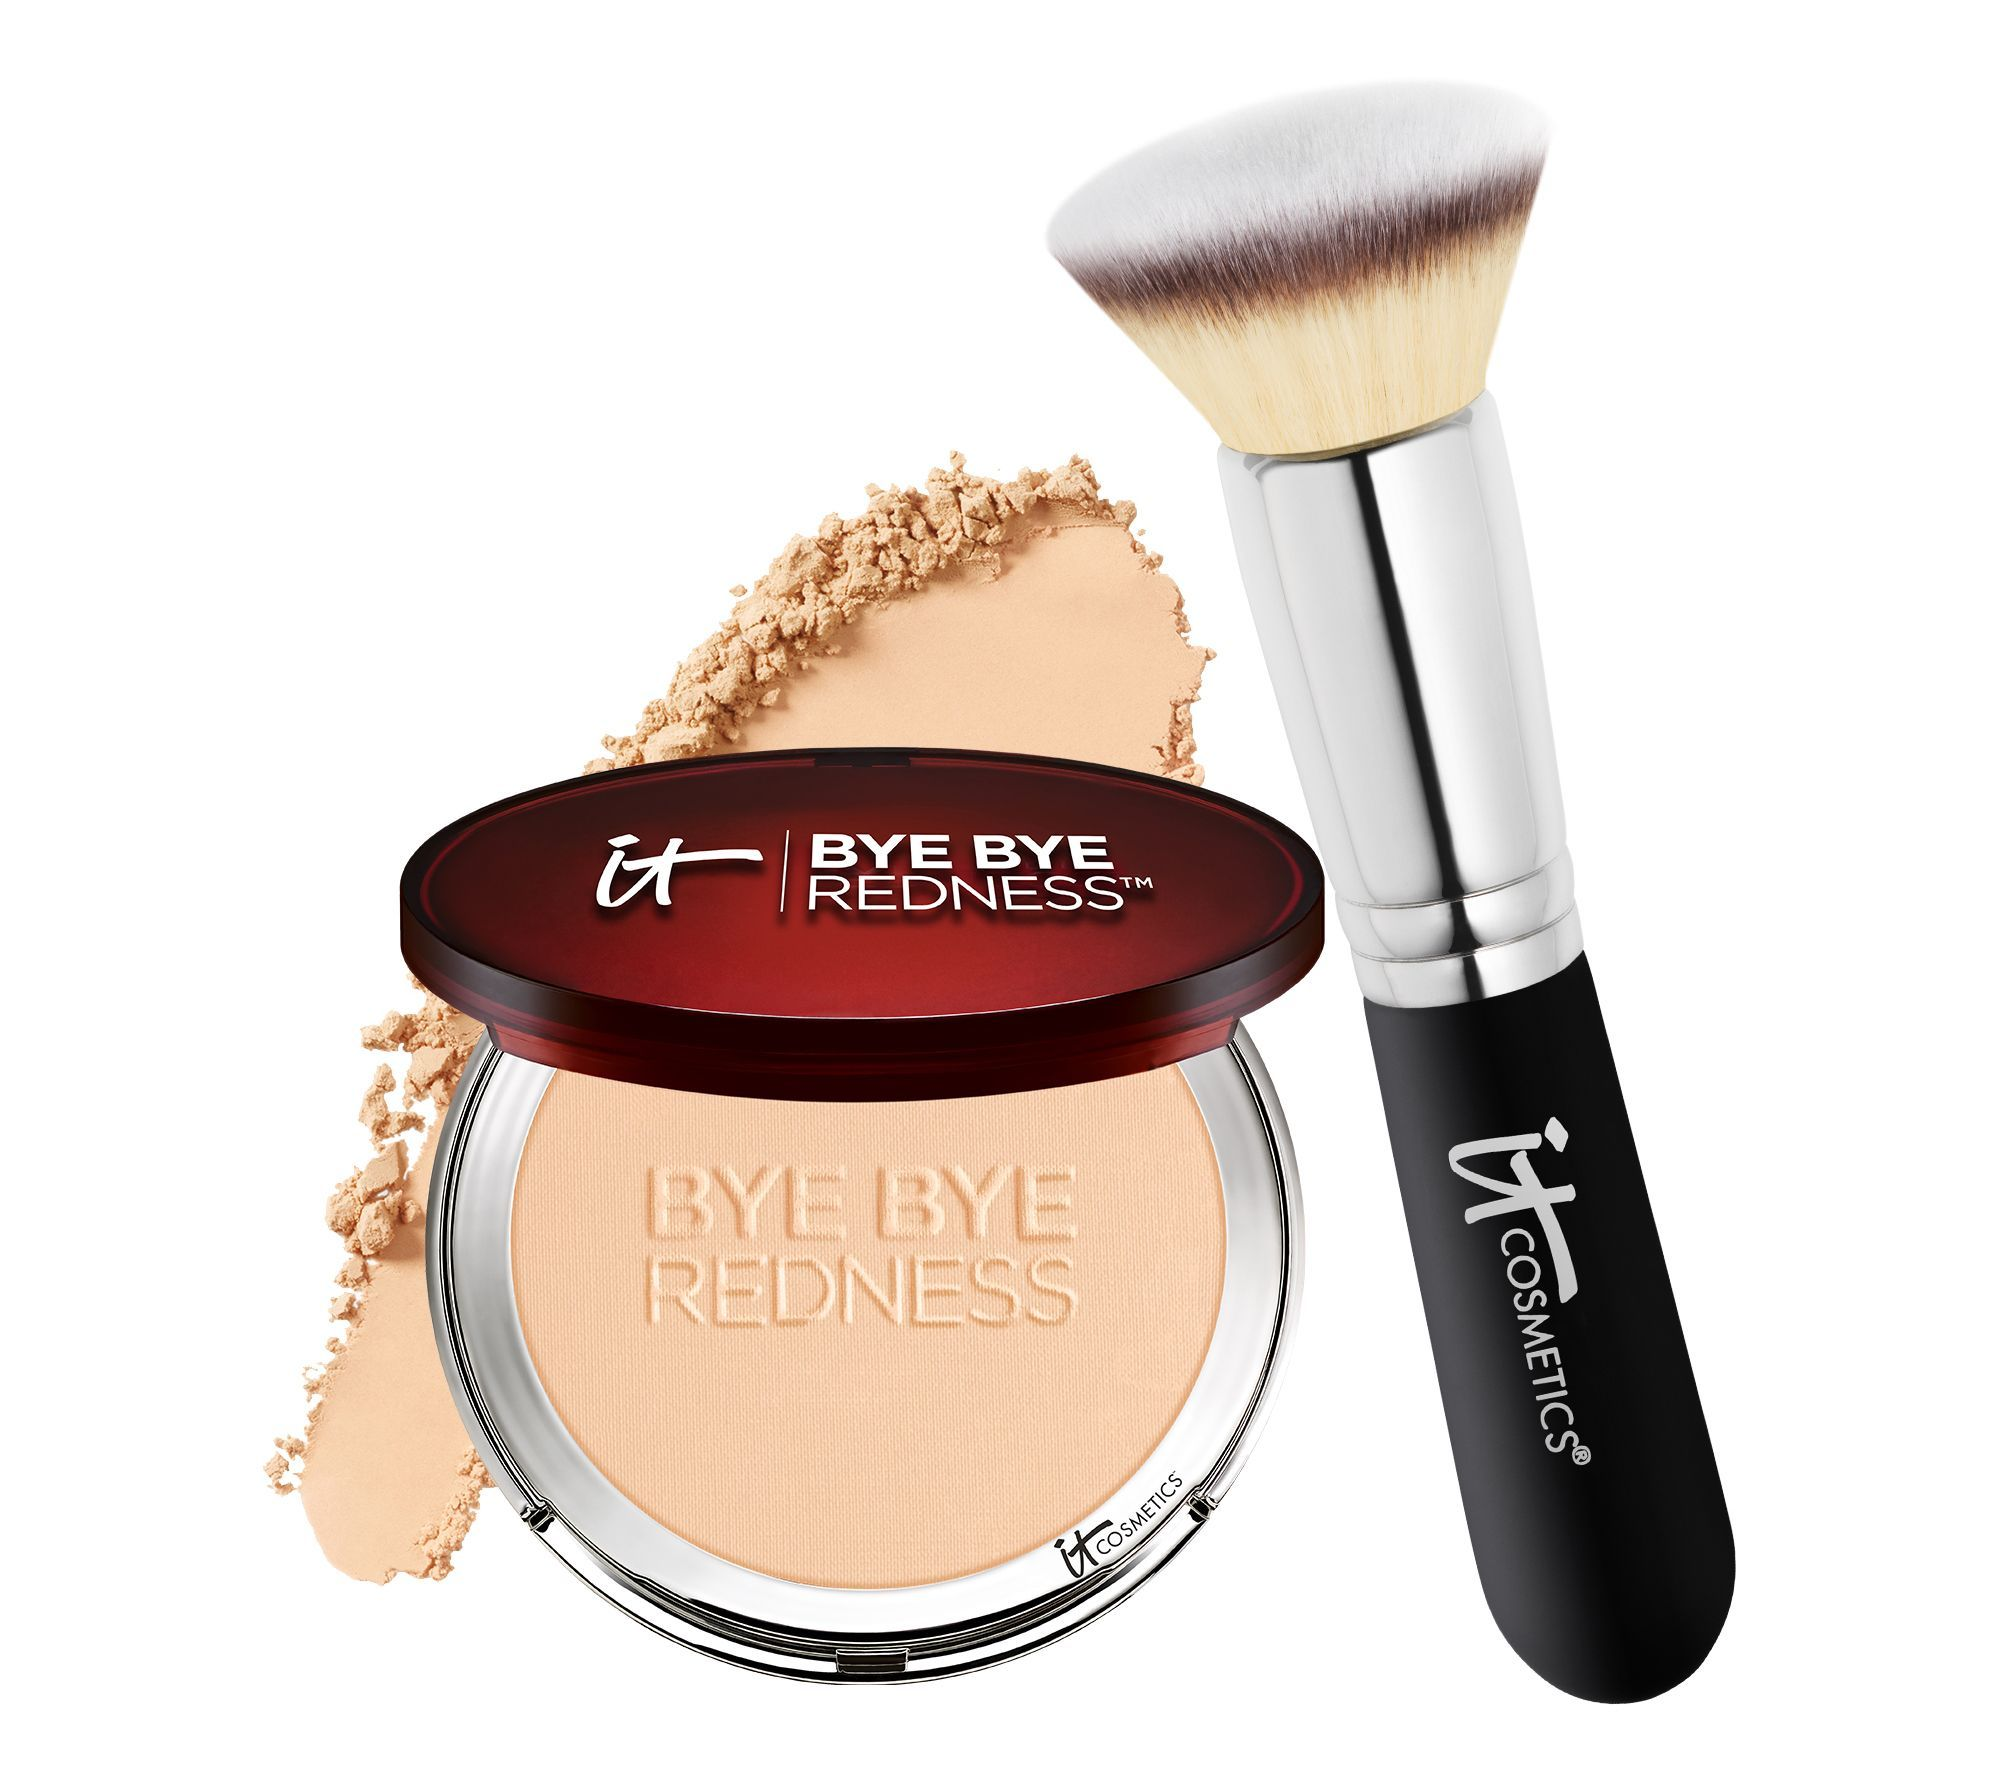 872c867bd34 PHOERA Soft Matte Liquid Foundation in 2019 | beauty products | Liquid  foundation, Matte foundation, Full coverage foundation